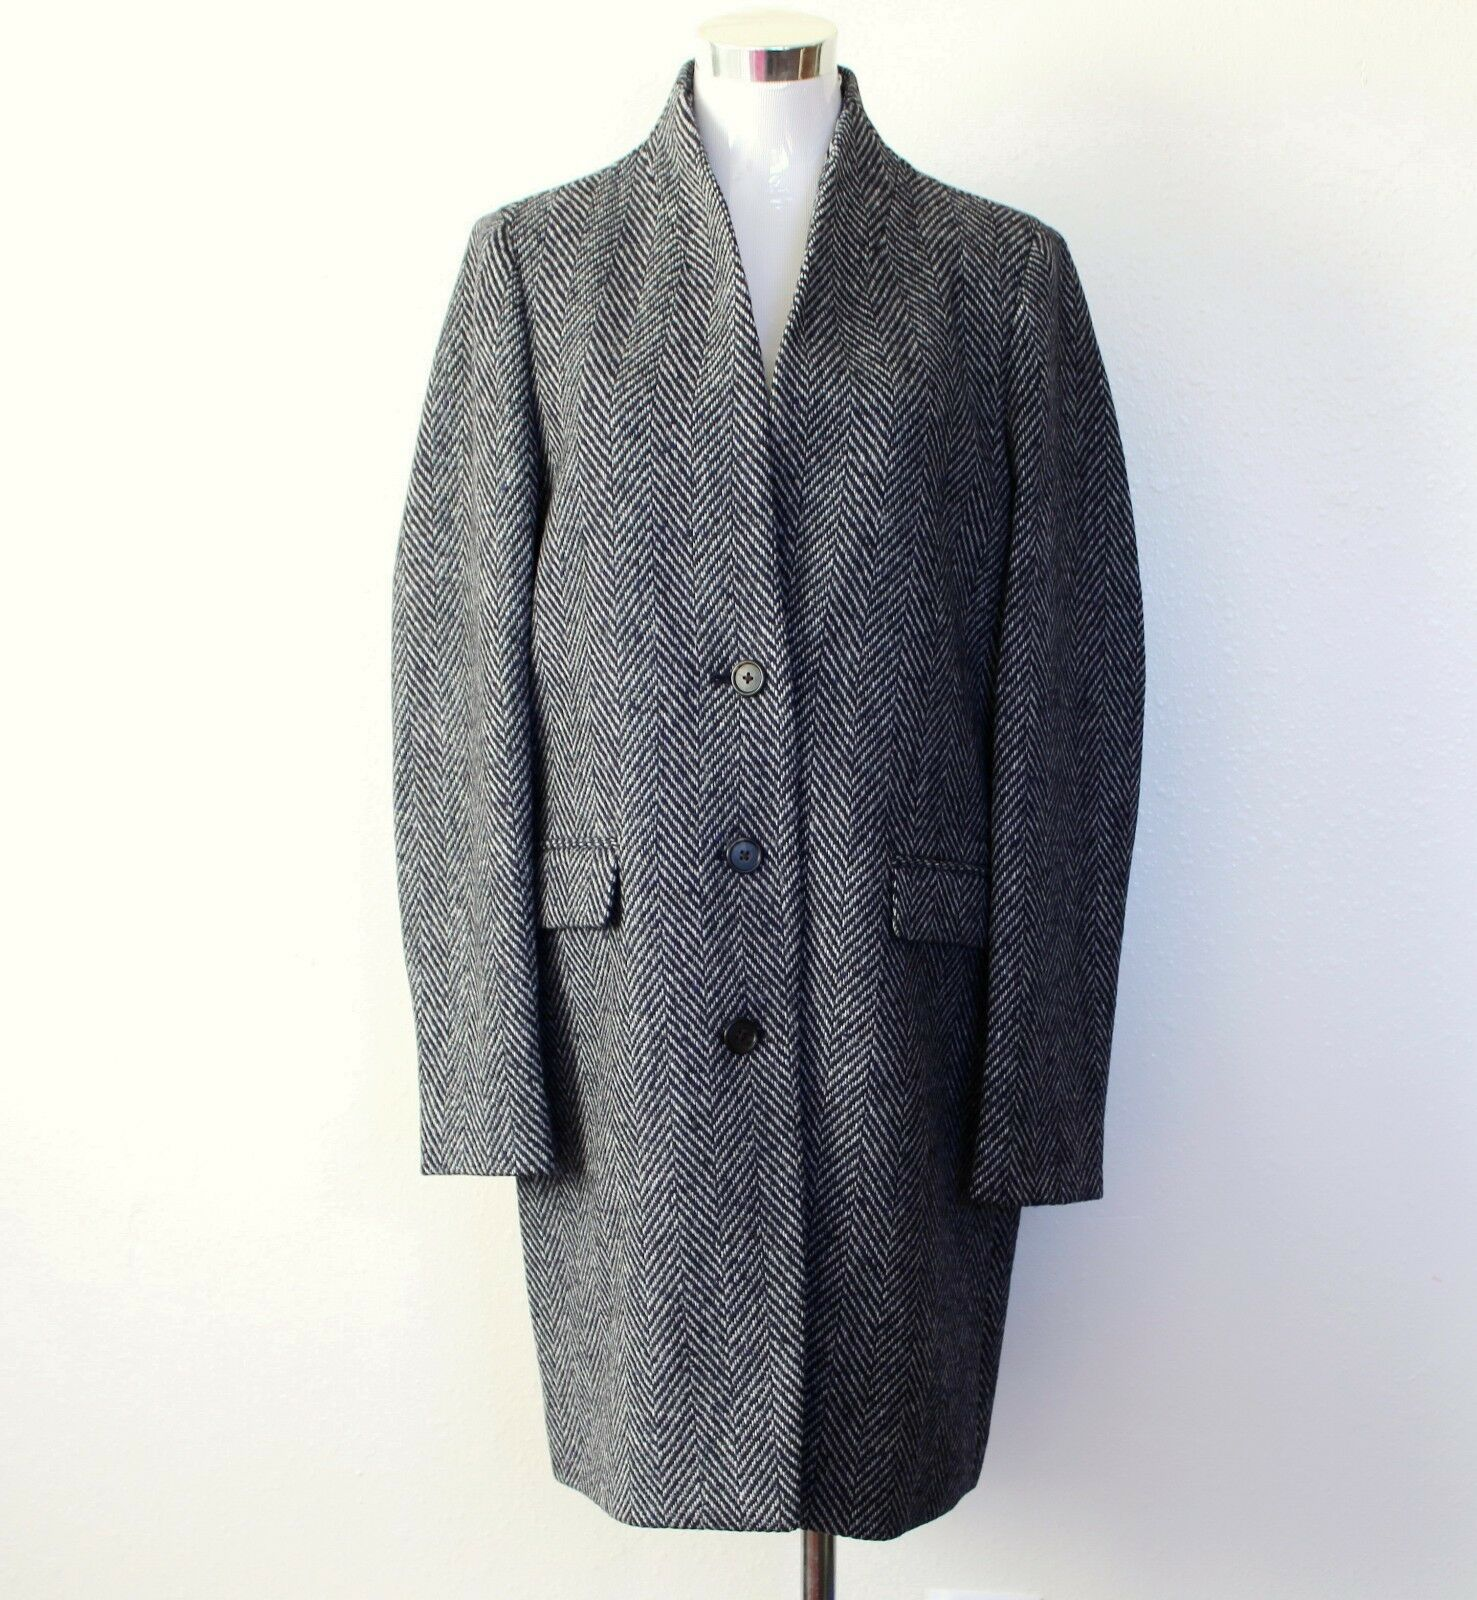 NWT Jcrew Wool Blend Standing Collar Oversize Topcoat , NAVY DONEGAL, P10 365